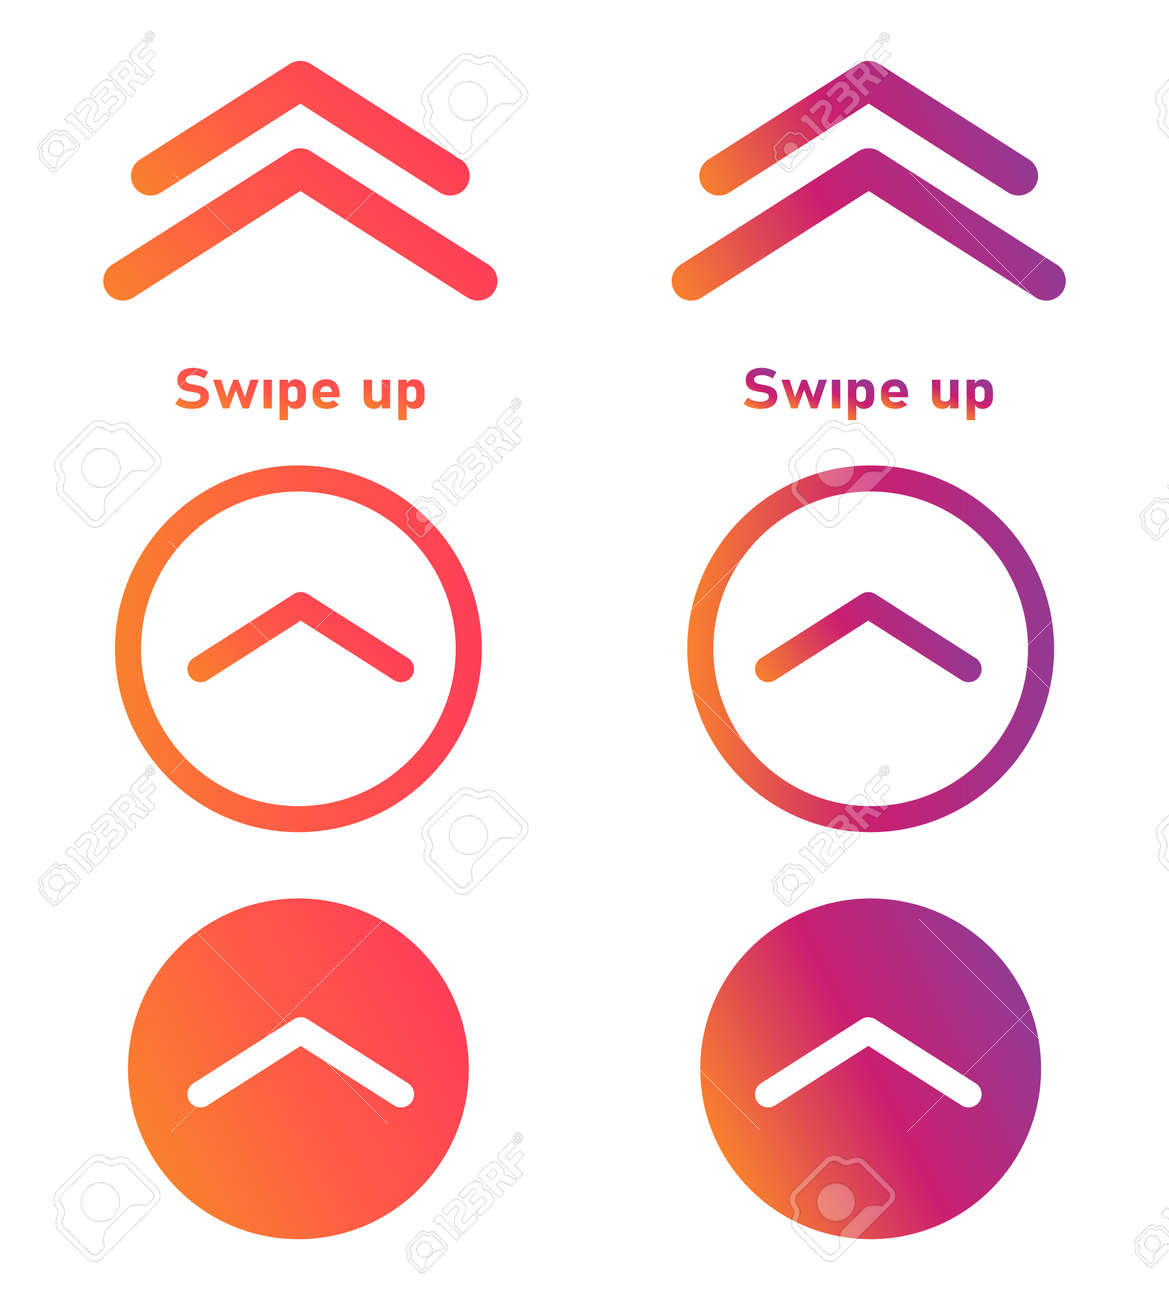 Swipe up vector button, template social media design. - 160537274